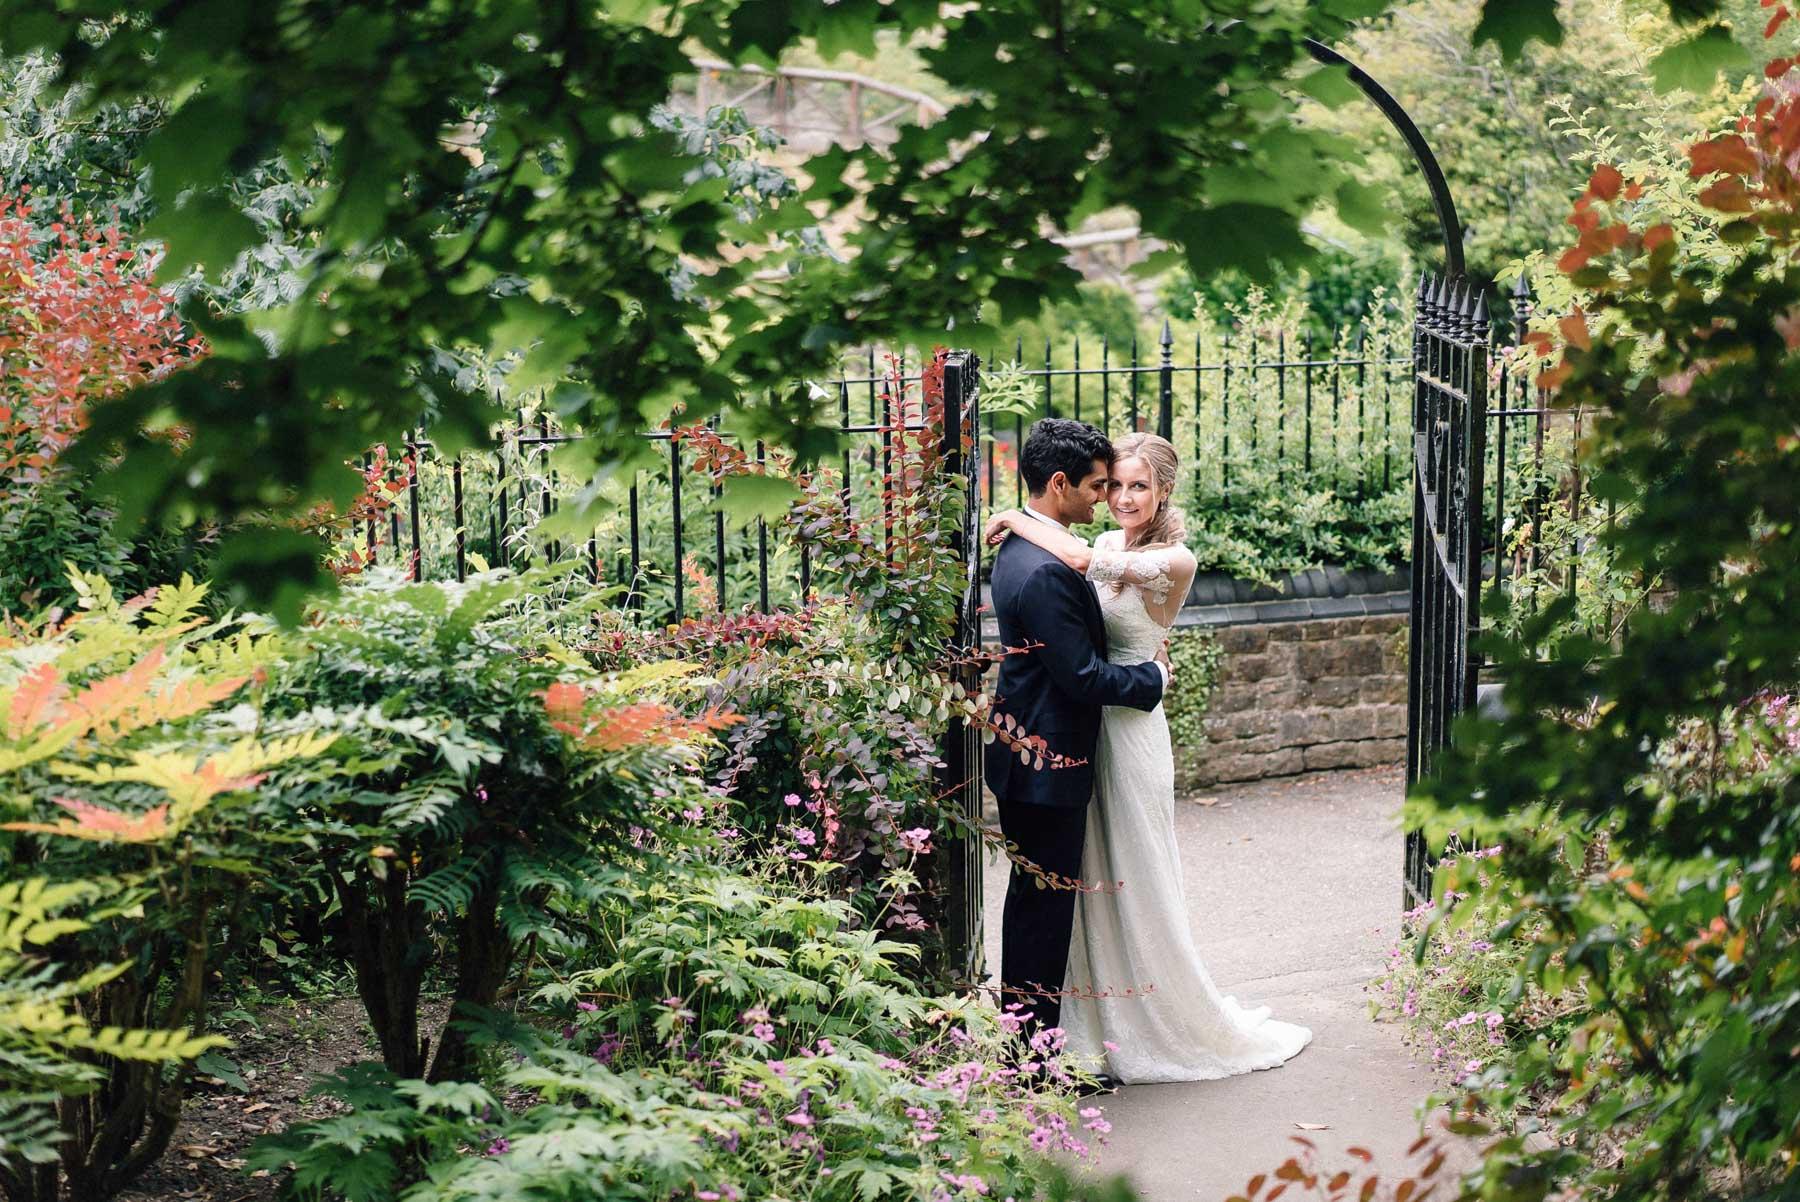 wedding photos at guildford castle